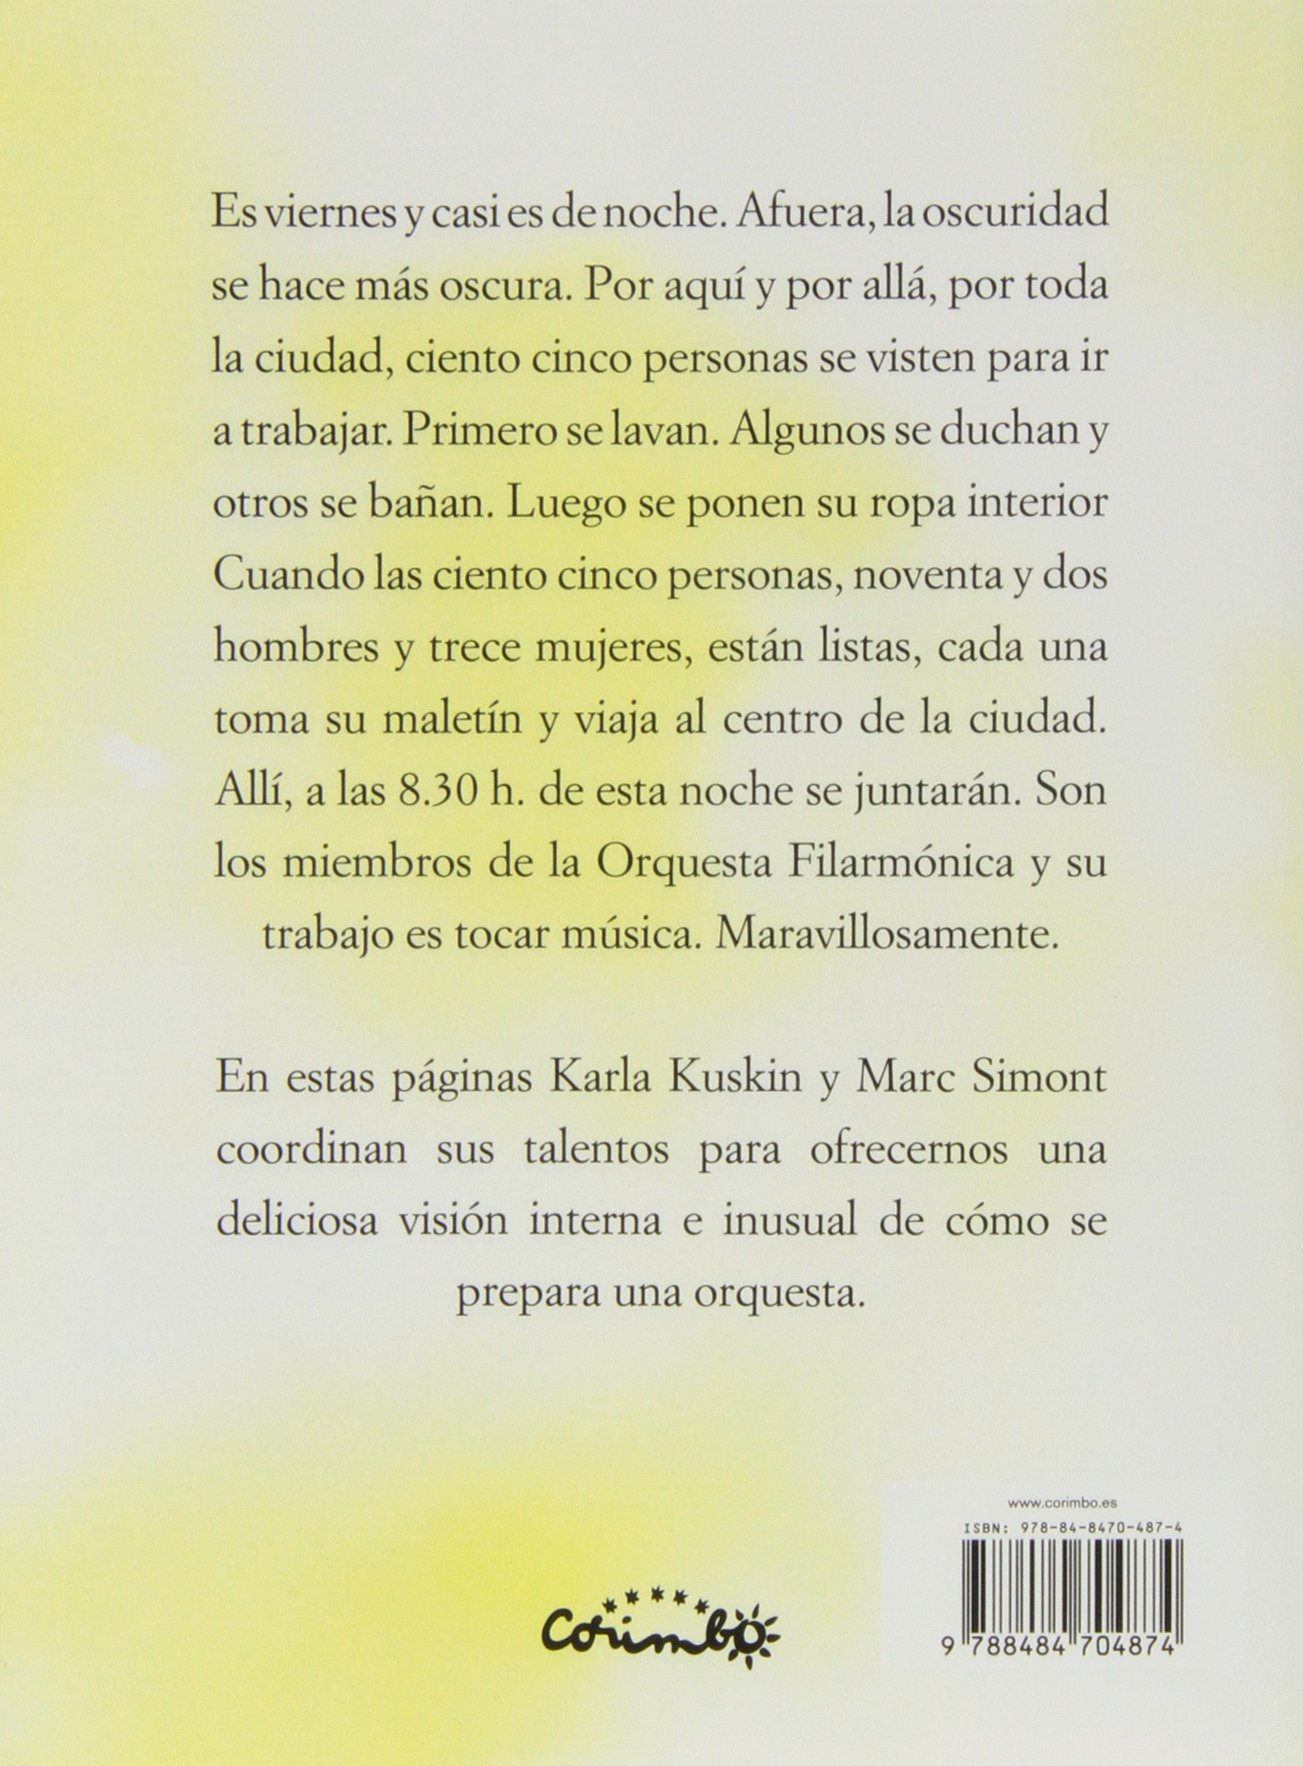 La filarmónica se viste (Spanish Edition): Karla Kuskin, Corimbo, Marc Simont: 9788484704874: Amazon.com: Books